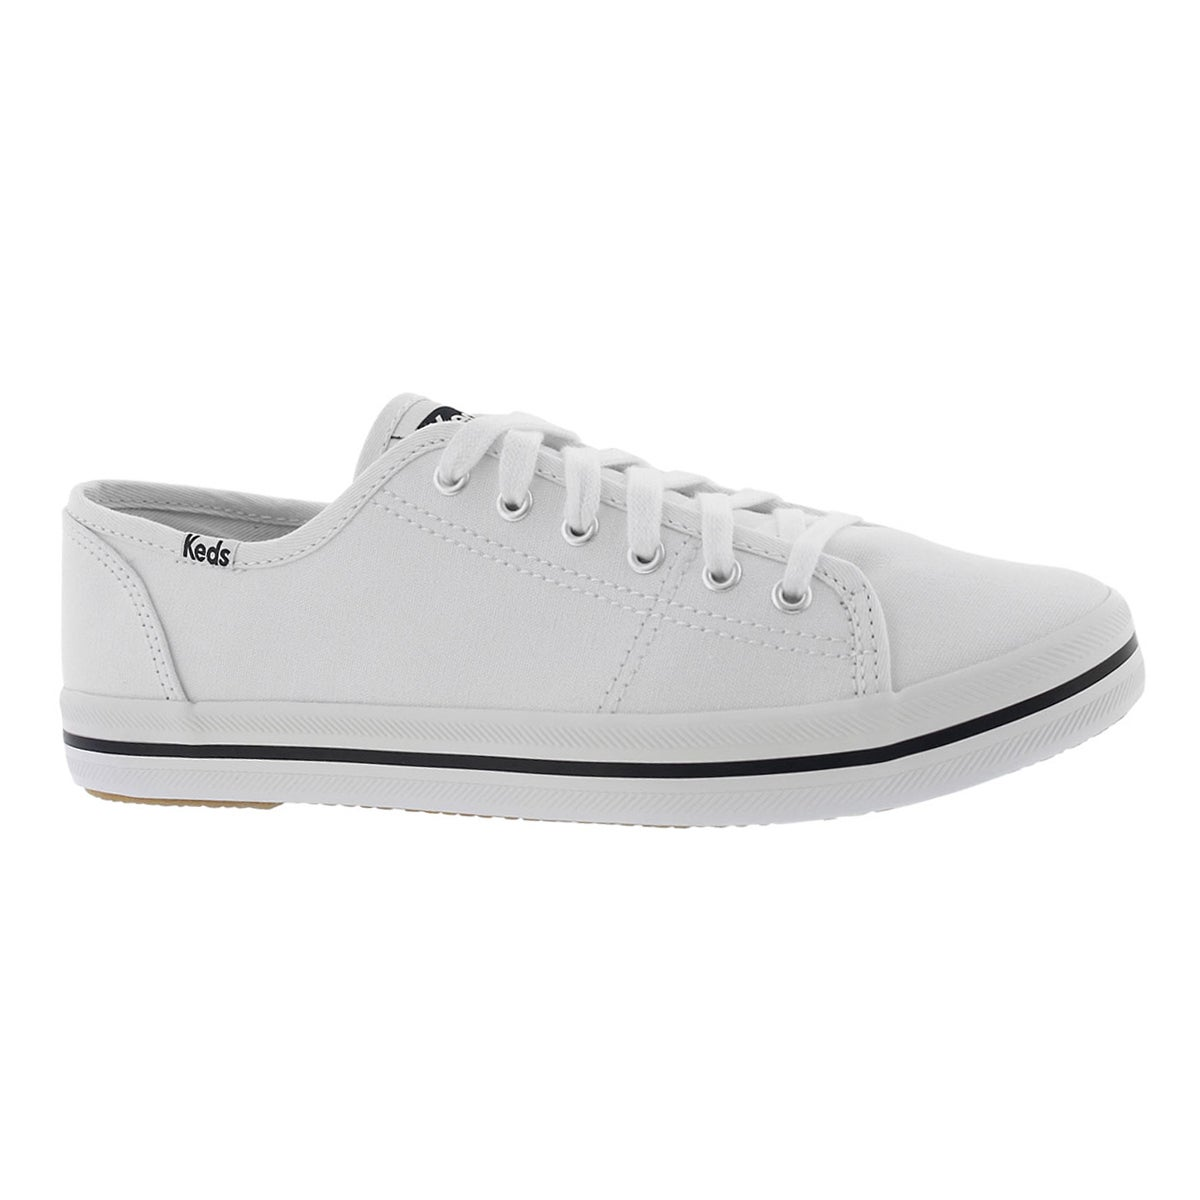 Women's KICKSTART CVO white canvas sneakers